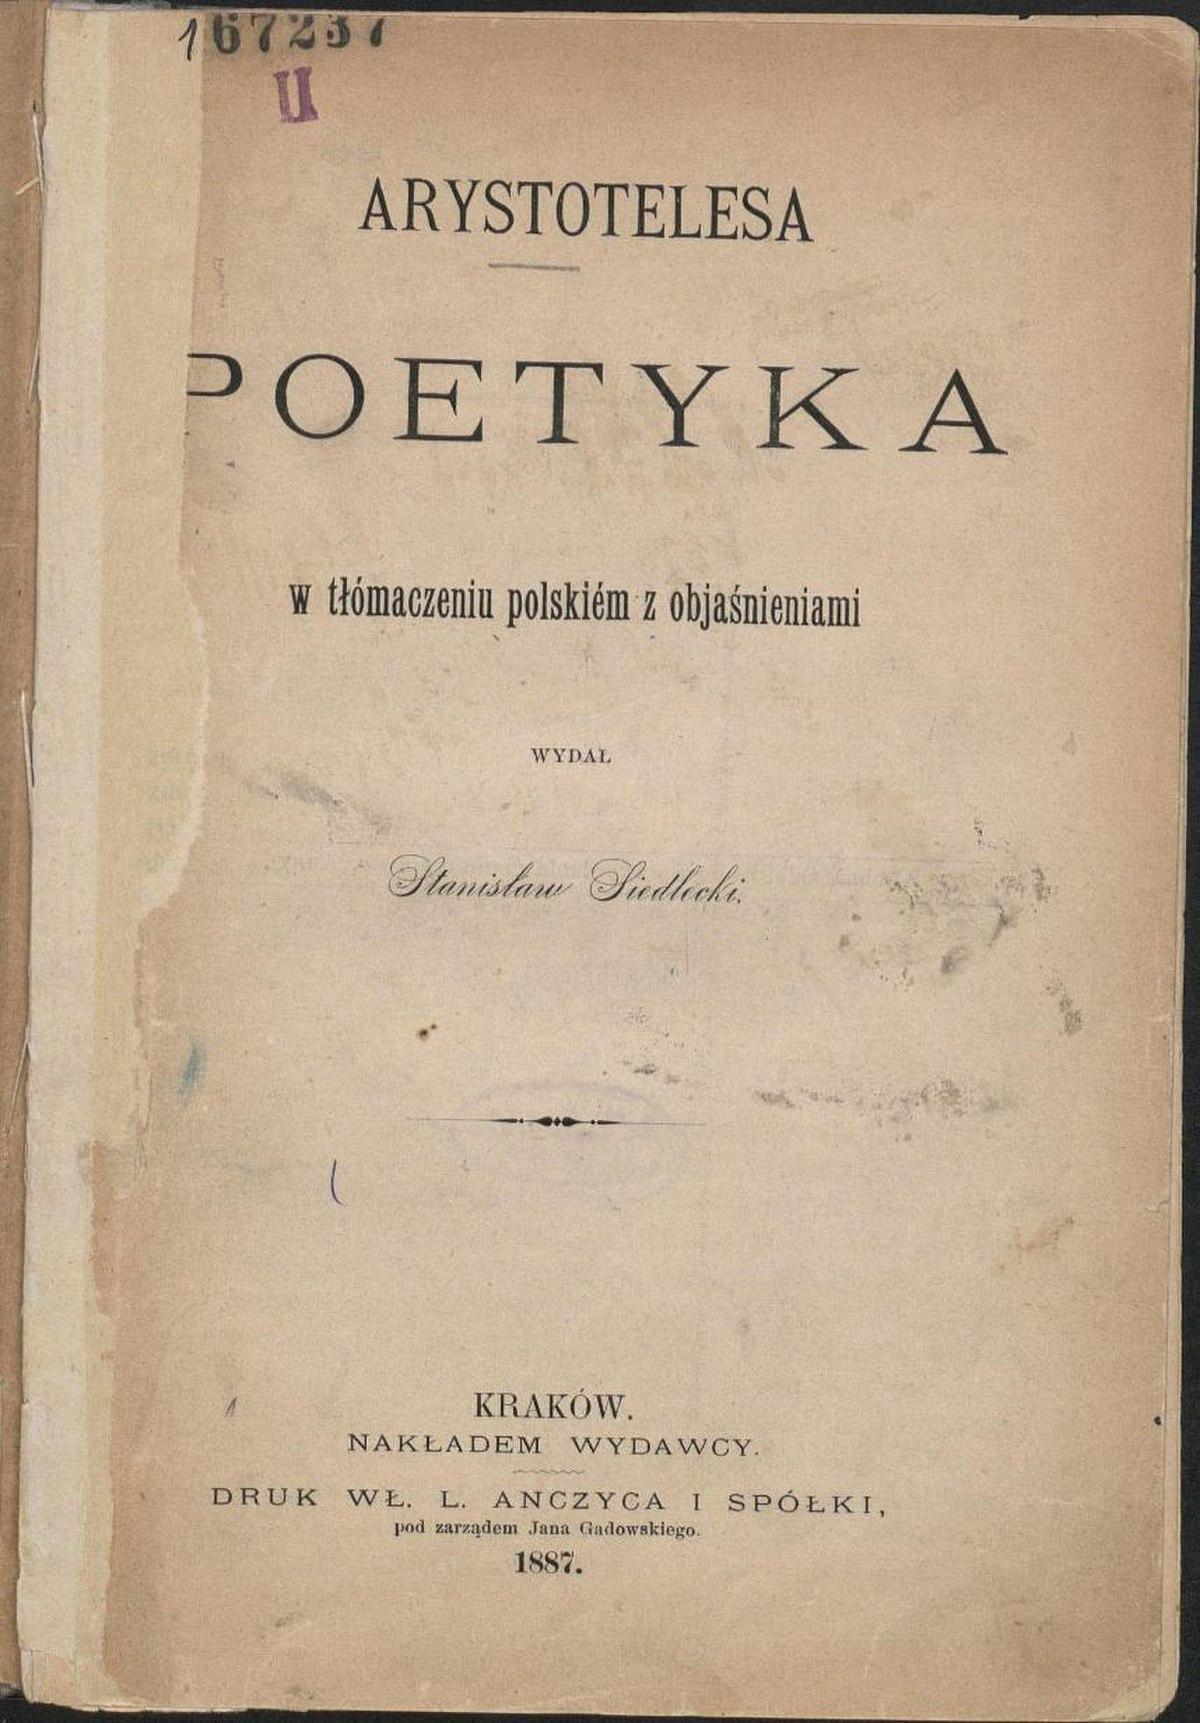 Poetyka Arystoteles Wikipedia Wolna Encyklopedia